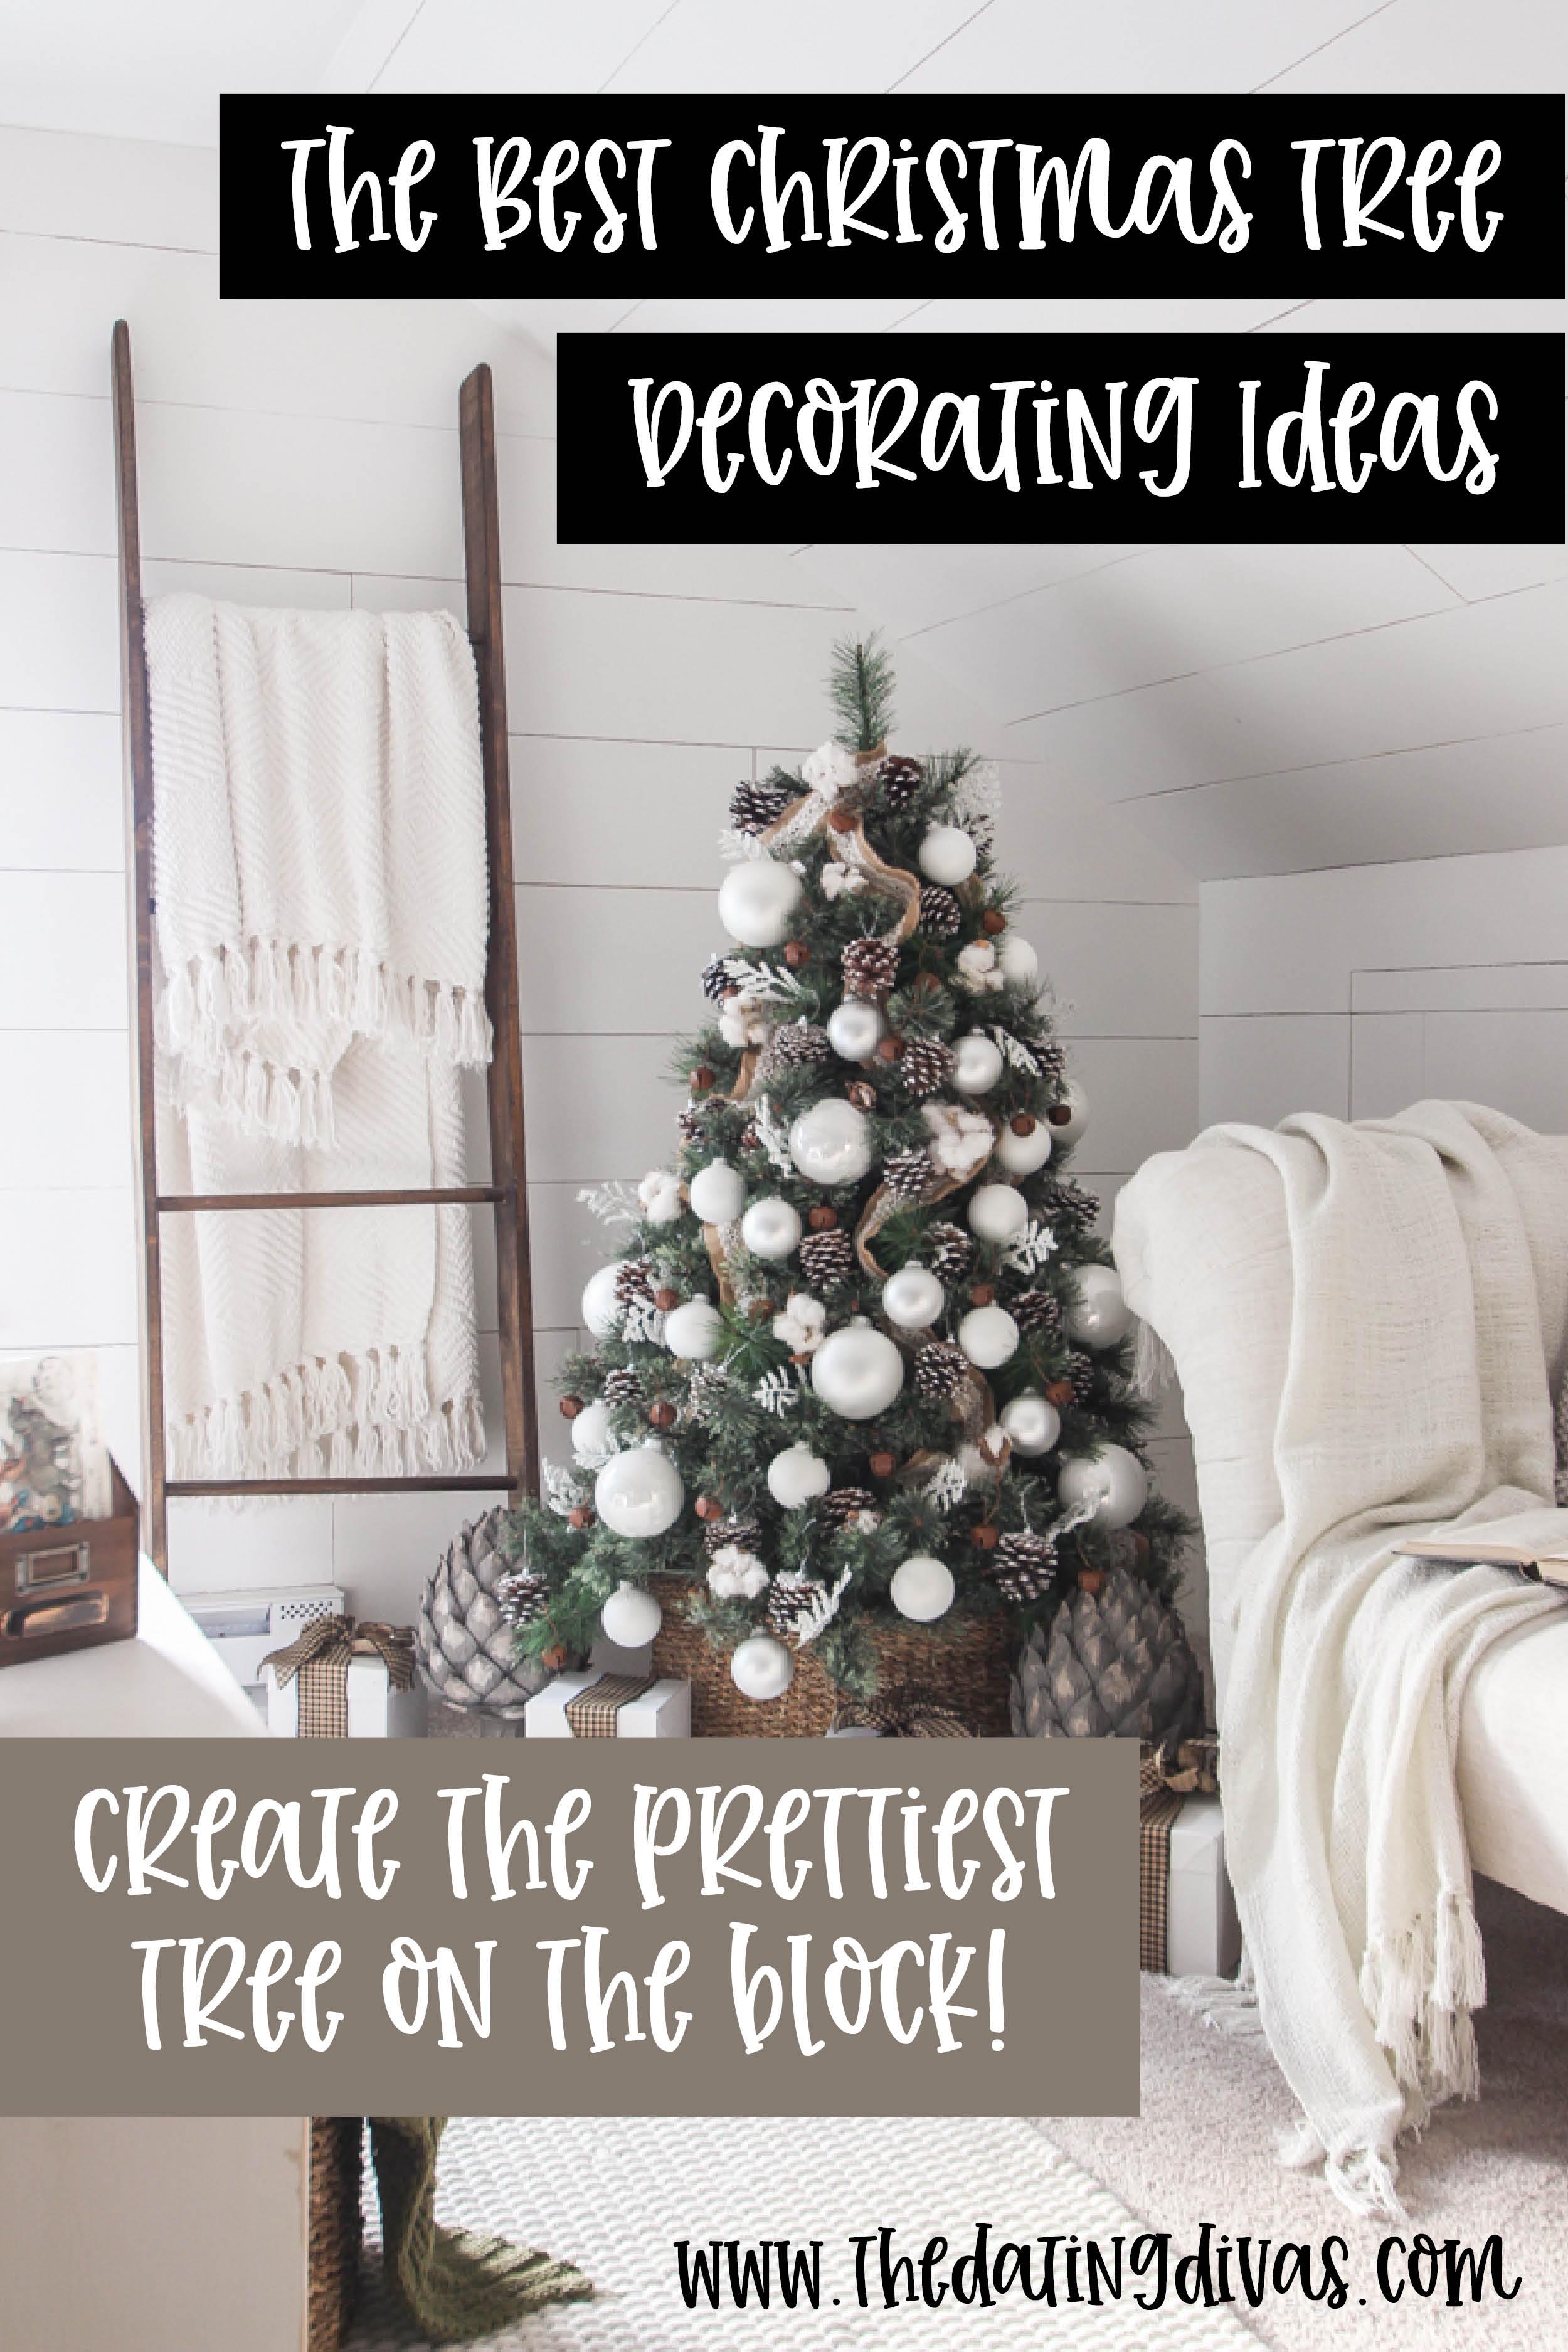 Christmas Tree Decorating Ideas | The Dating Divas